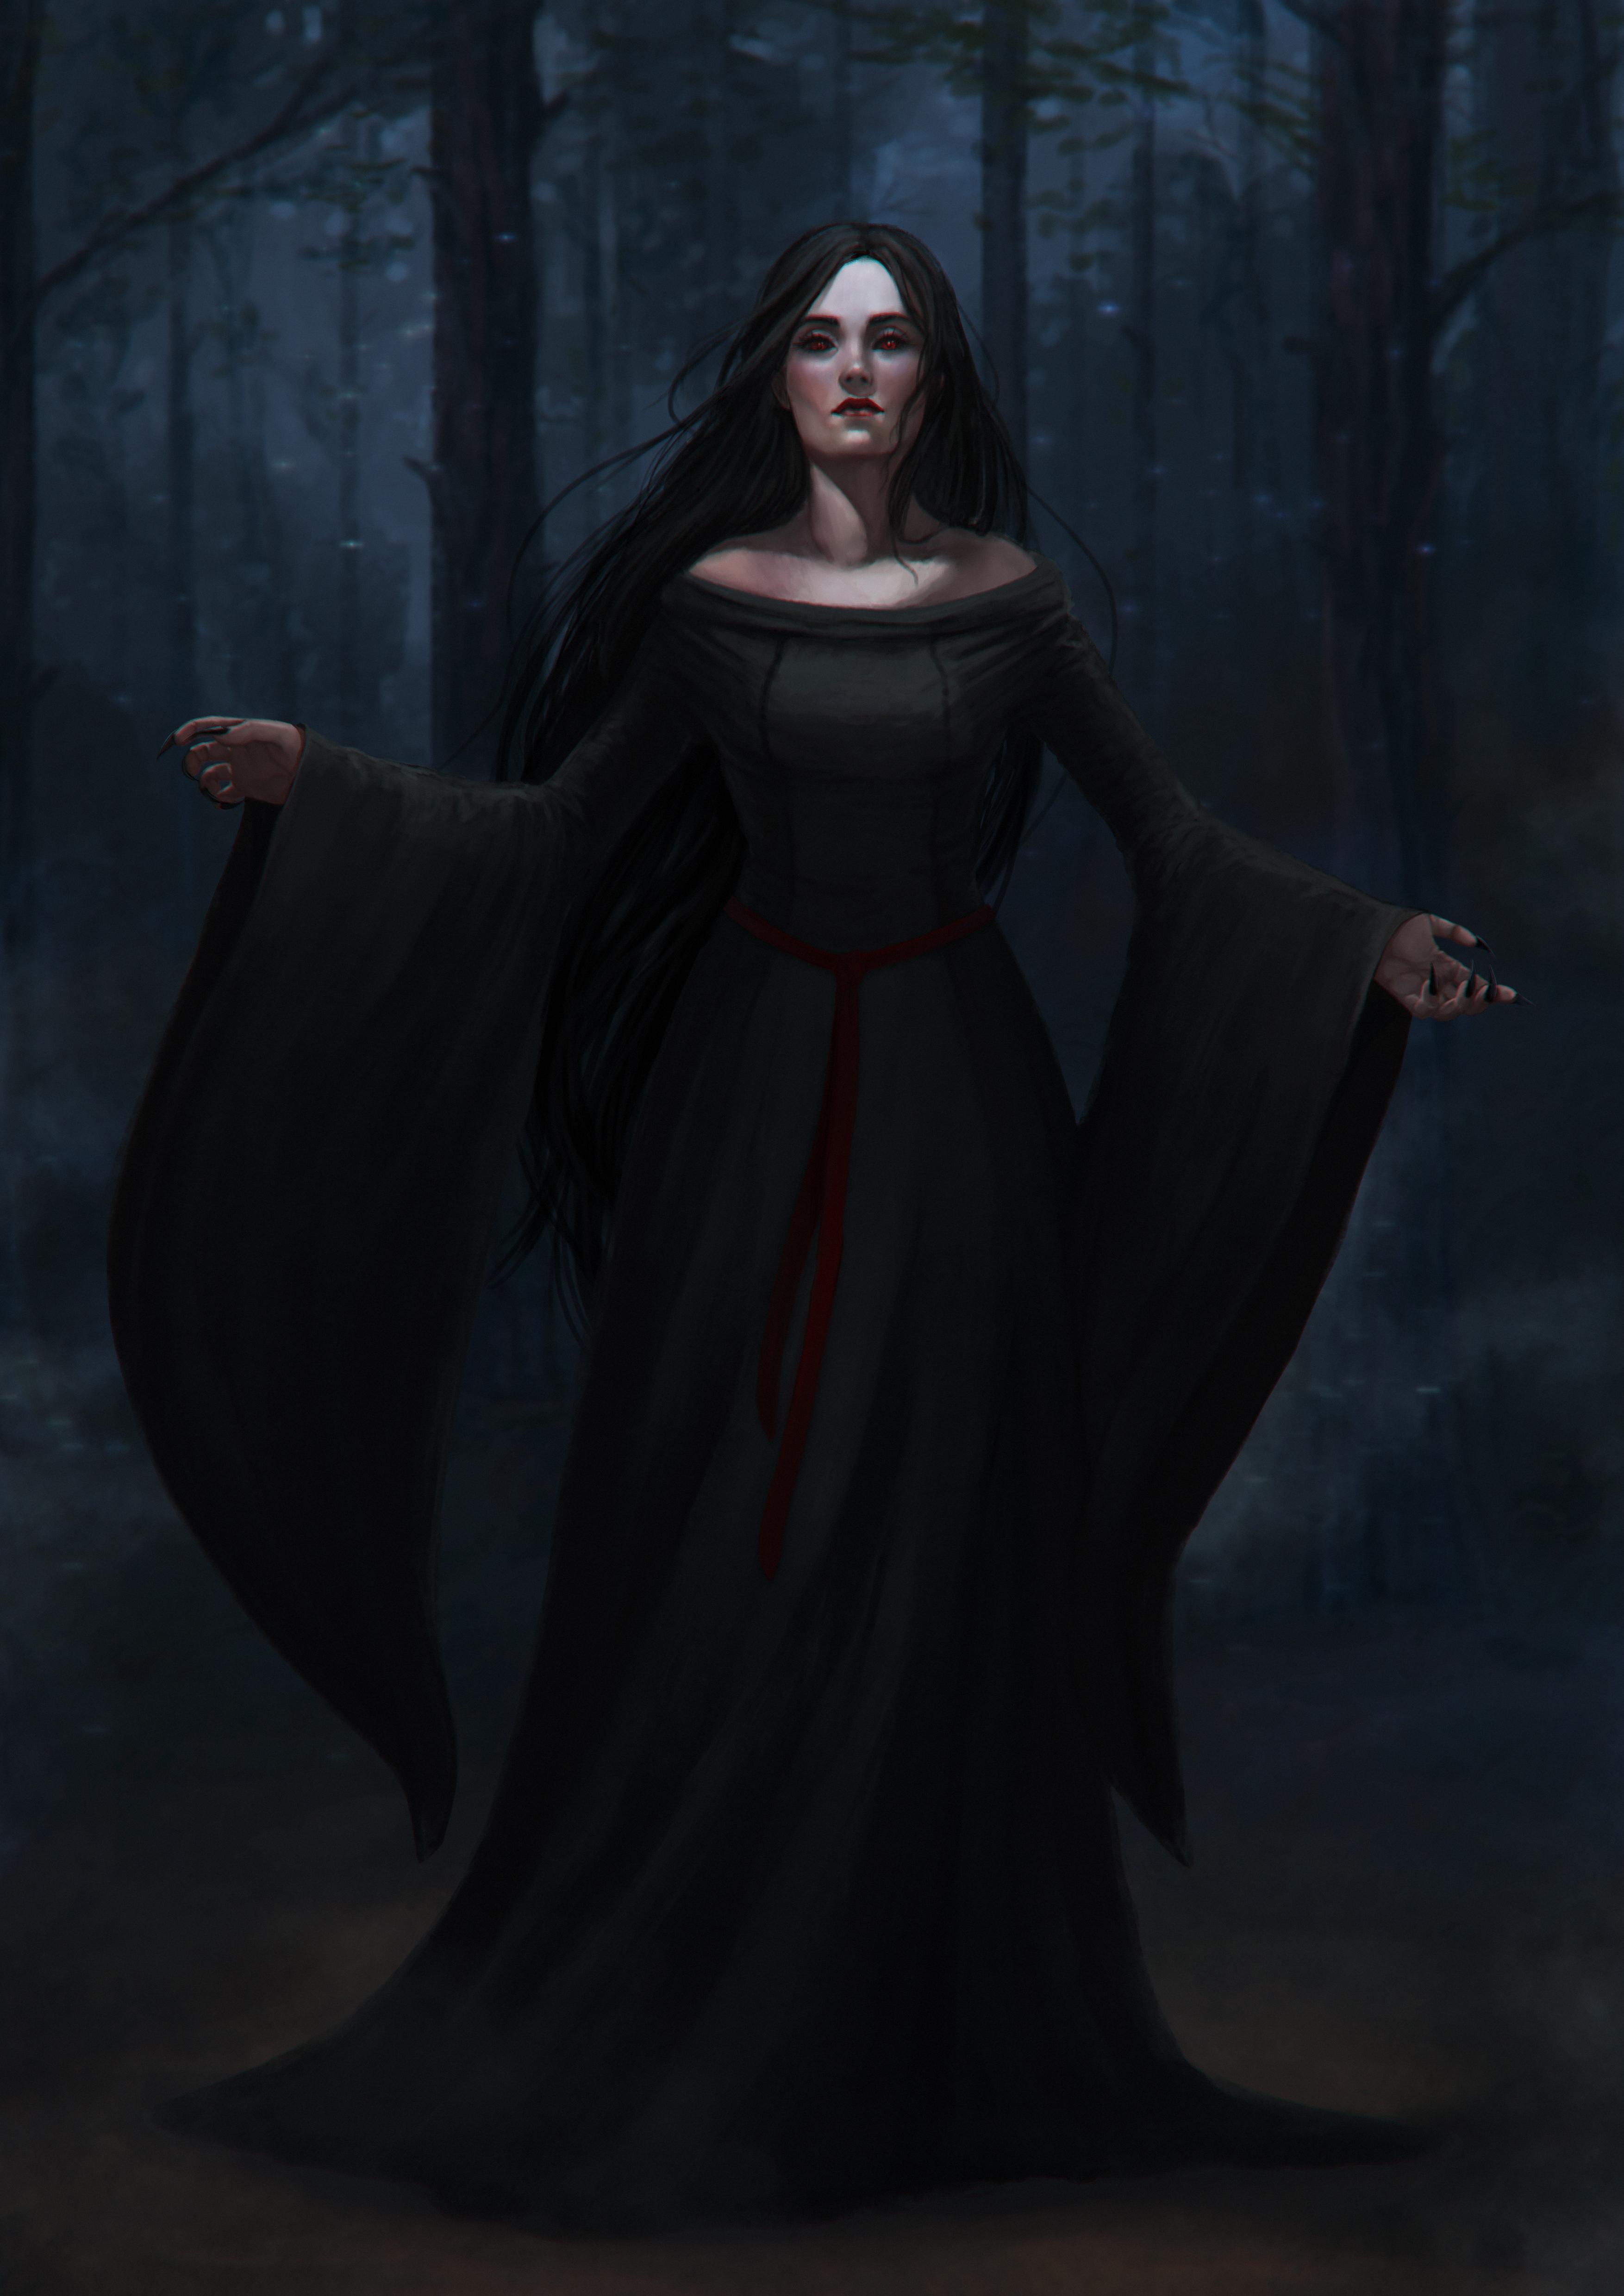 vampire_by_amionna-dbktah7.jpg